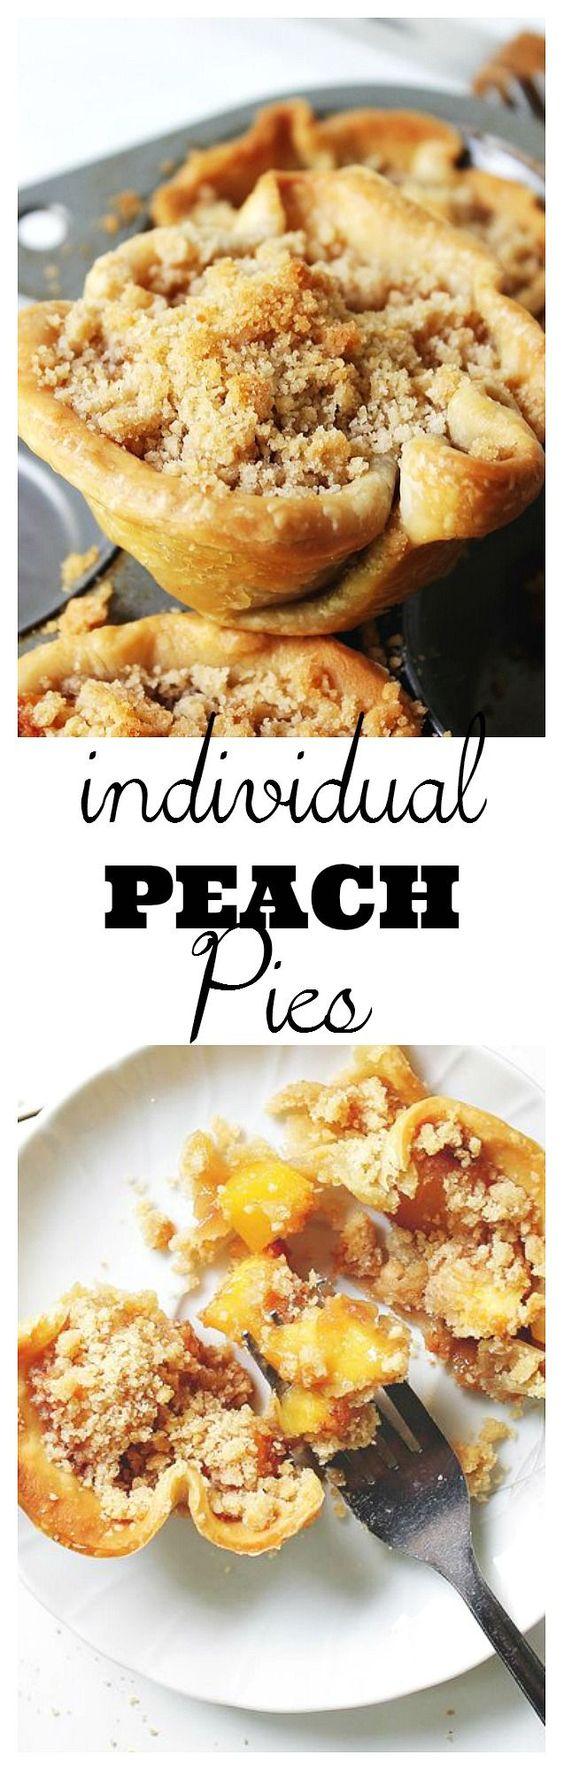 ... pie fillings peaches individual pies fresh peach pies brown sugar pies